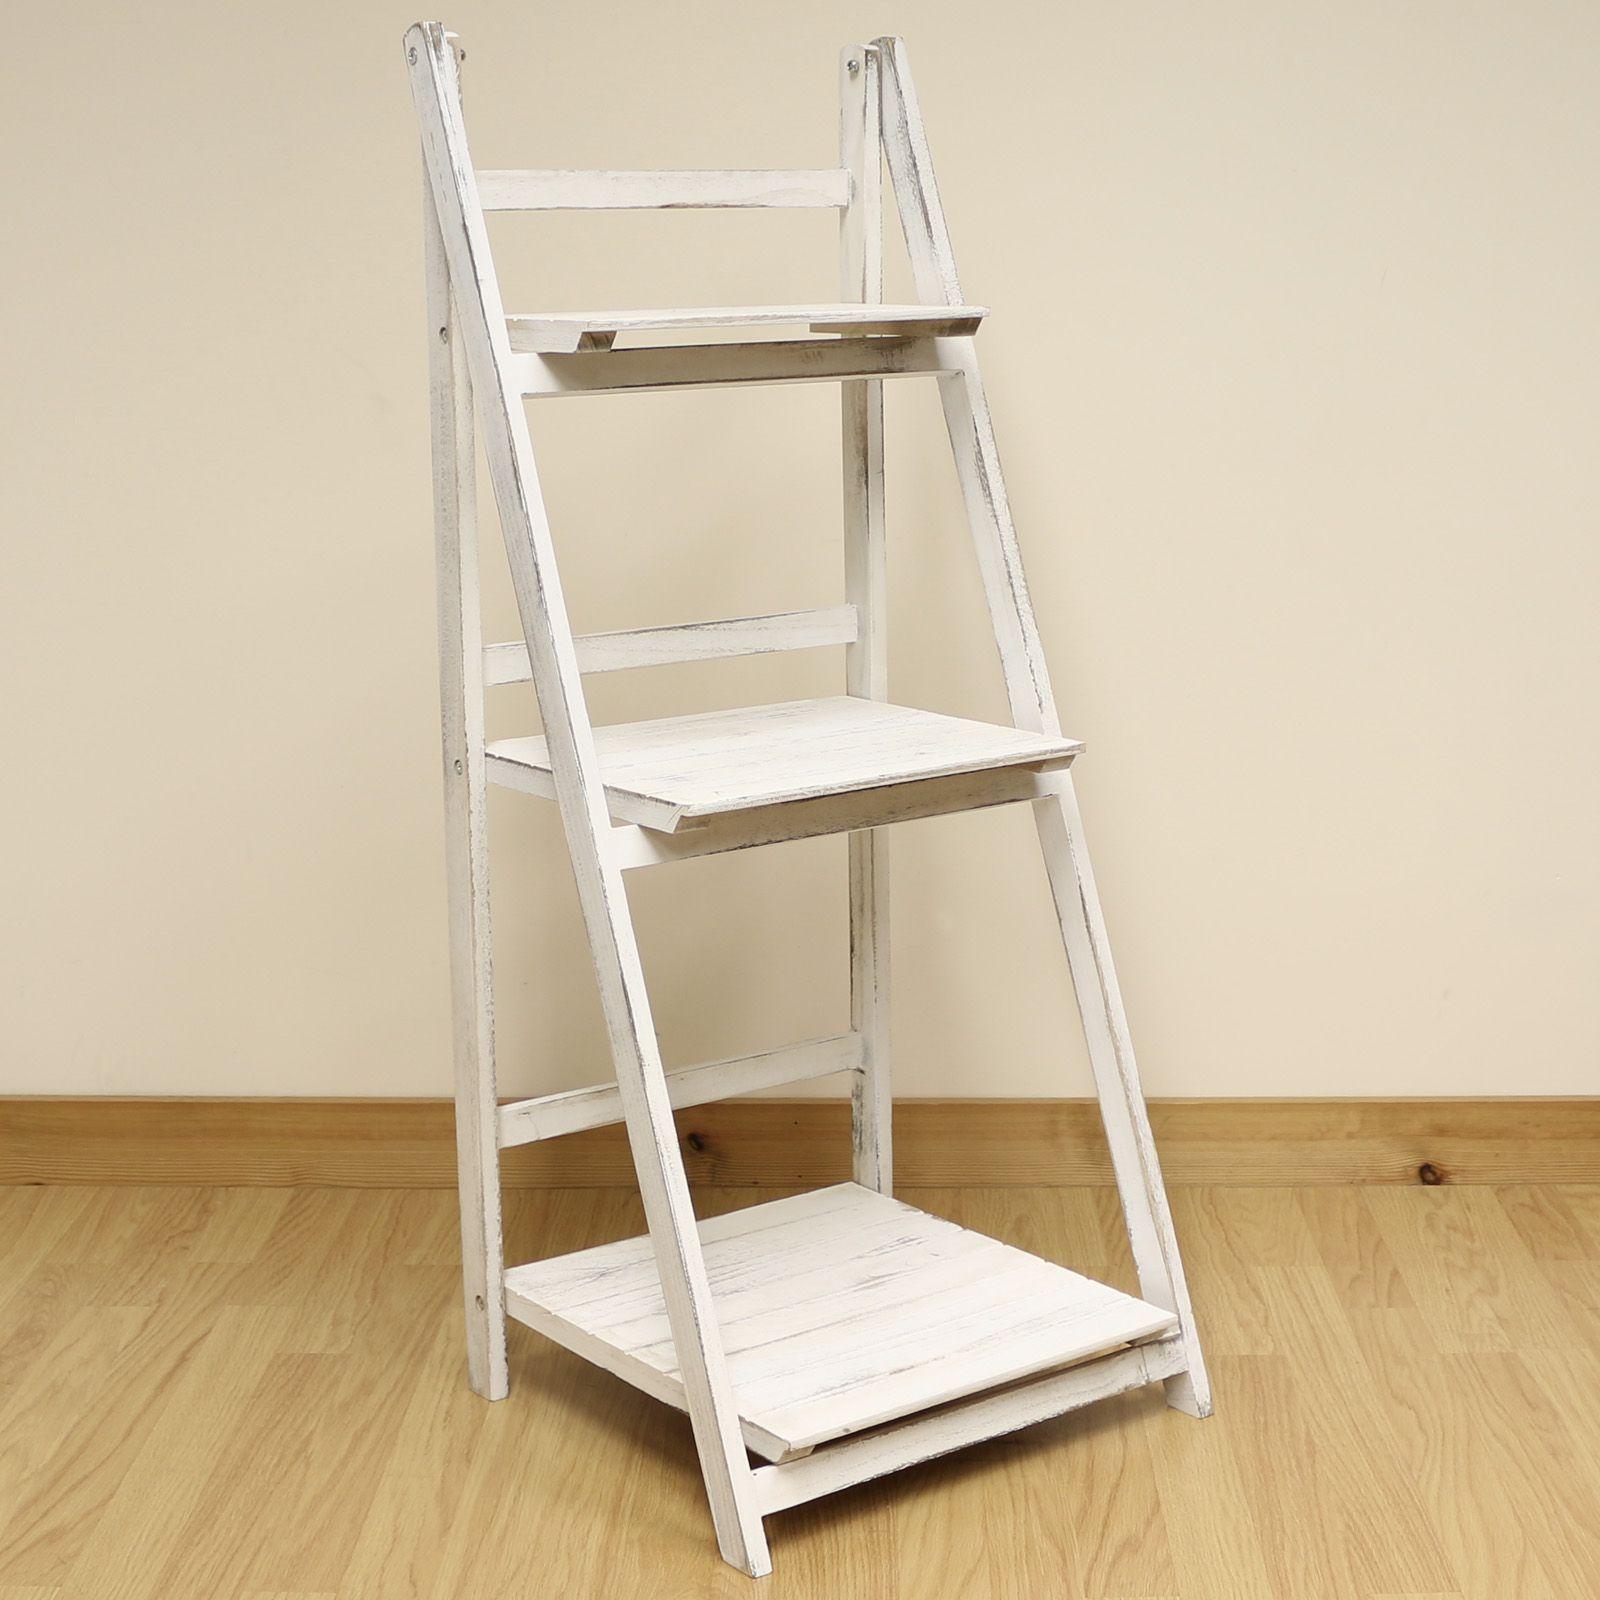 Simple White Wooden Ladder Shelf